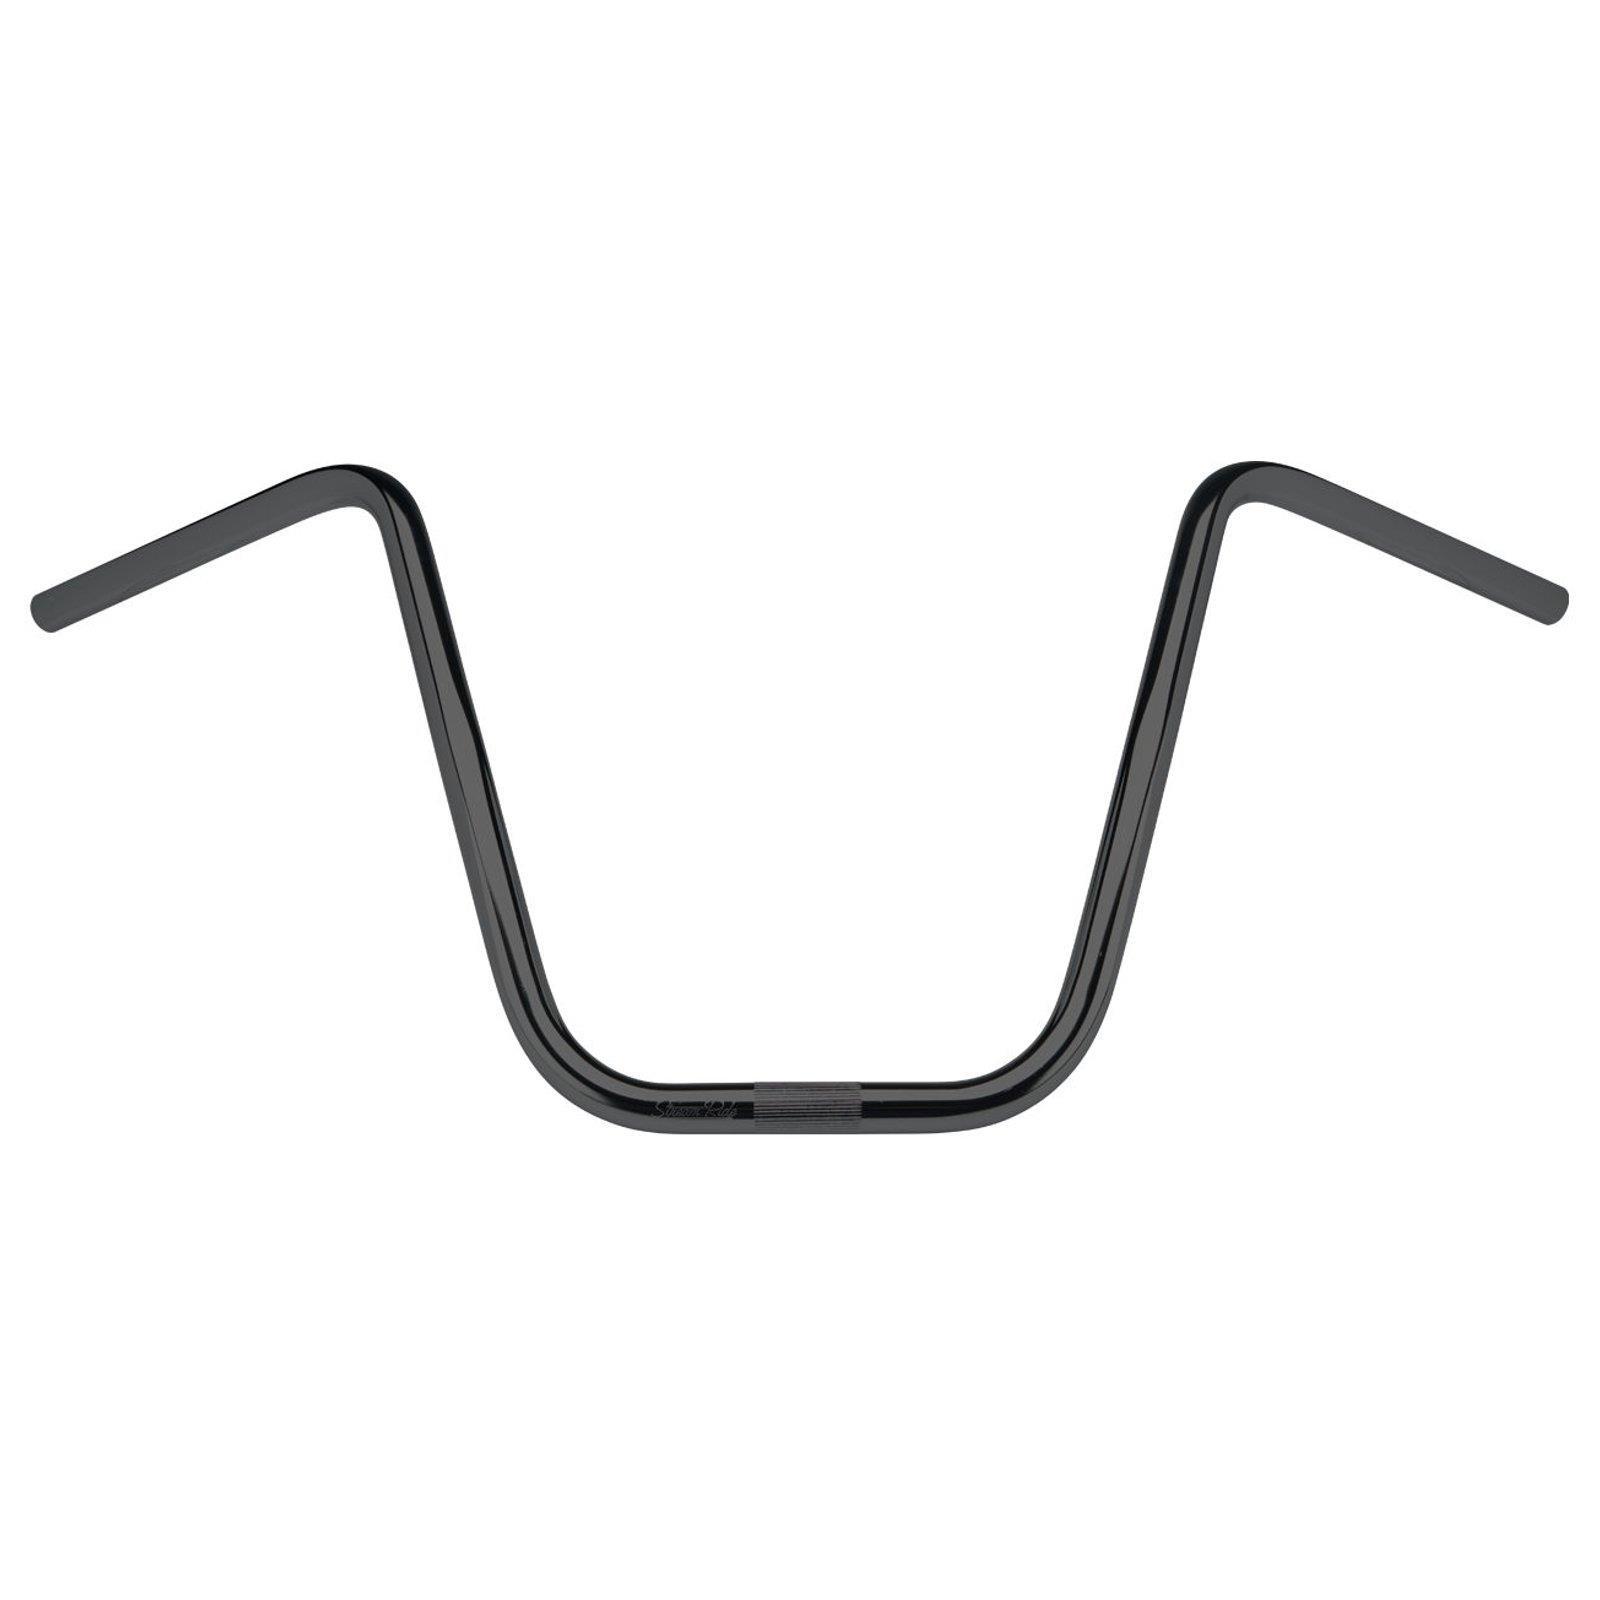 electra lenker cruiser ape hanger handlebar ersatzteil bar. Black Bedroom Furniture Sets. Home Design Ideas